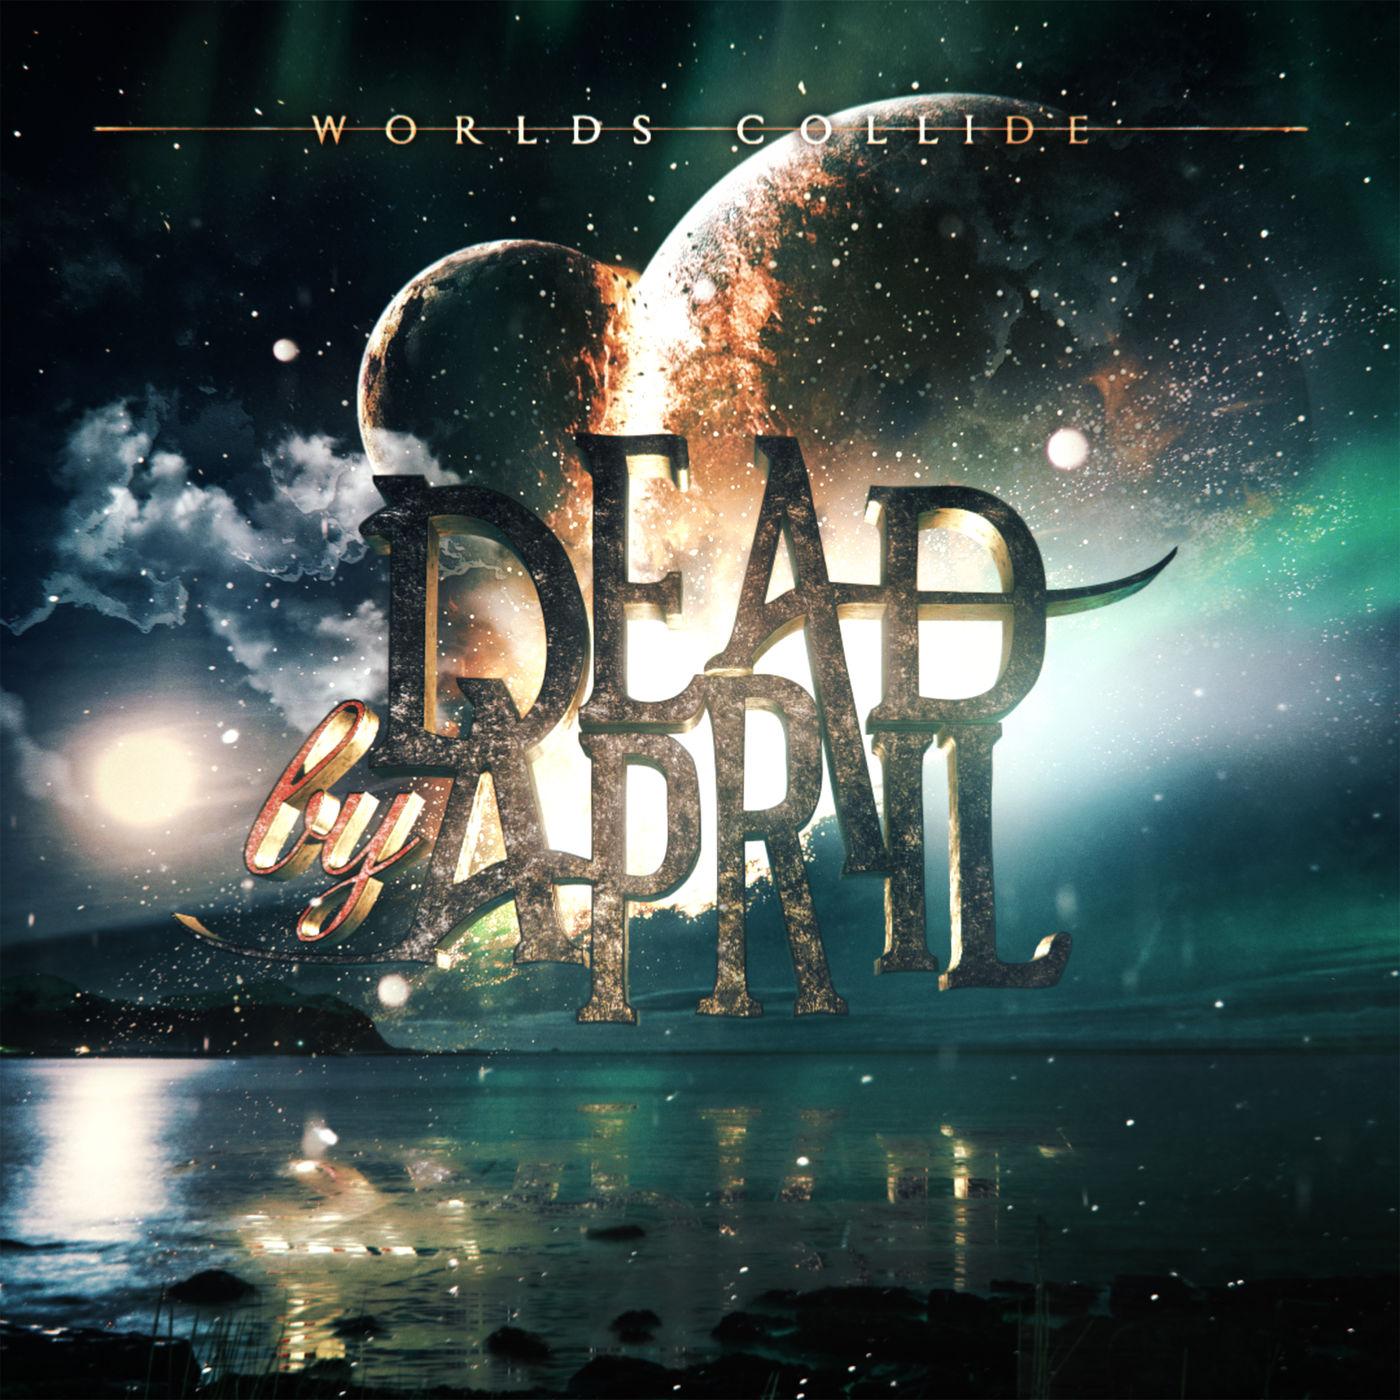 dead_by_april_worlds_collide_album_front_cover_borito_2017.jpg